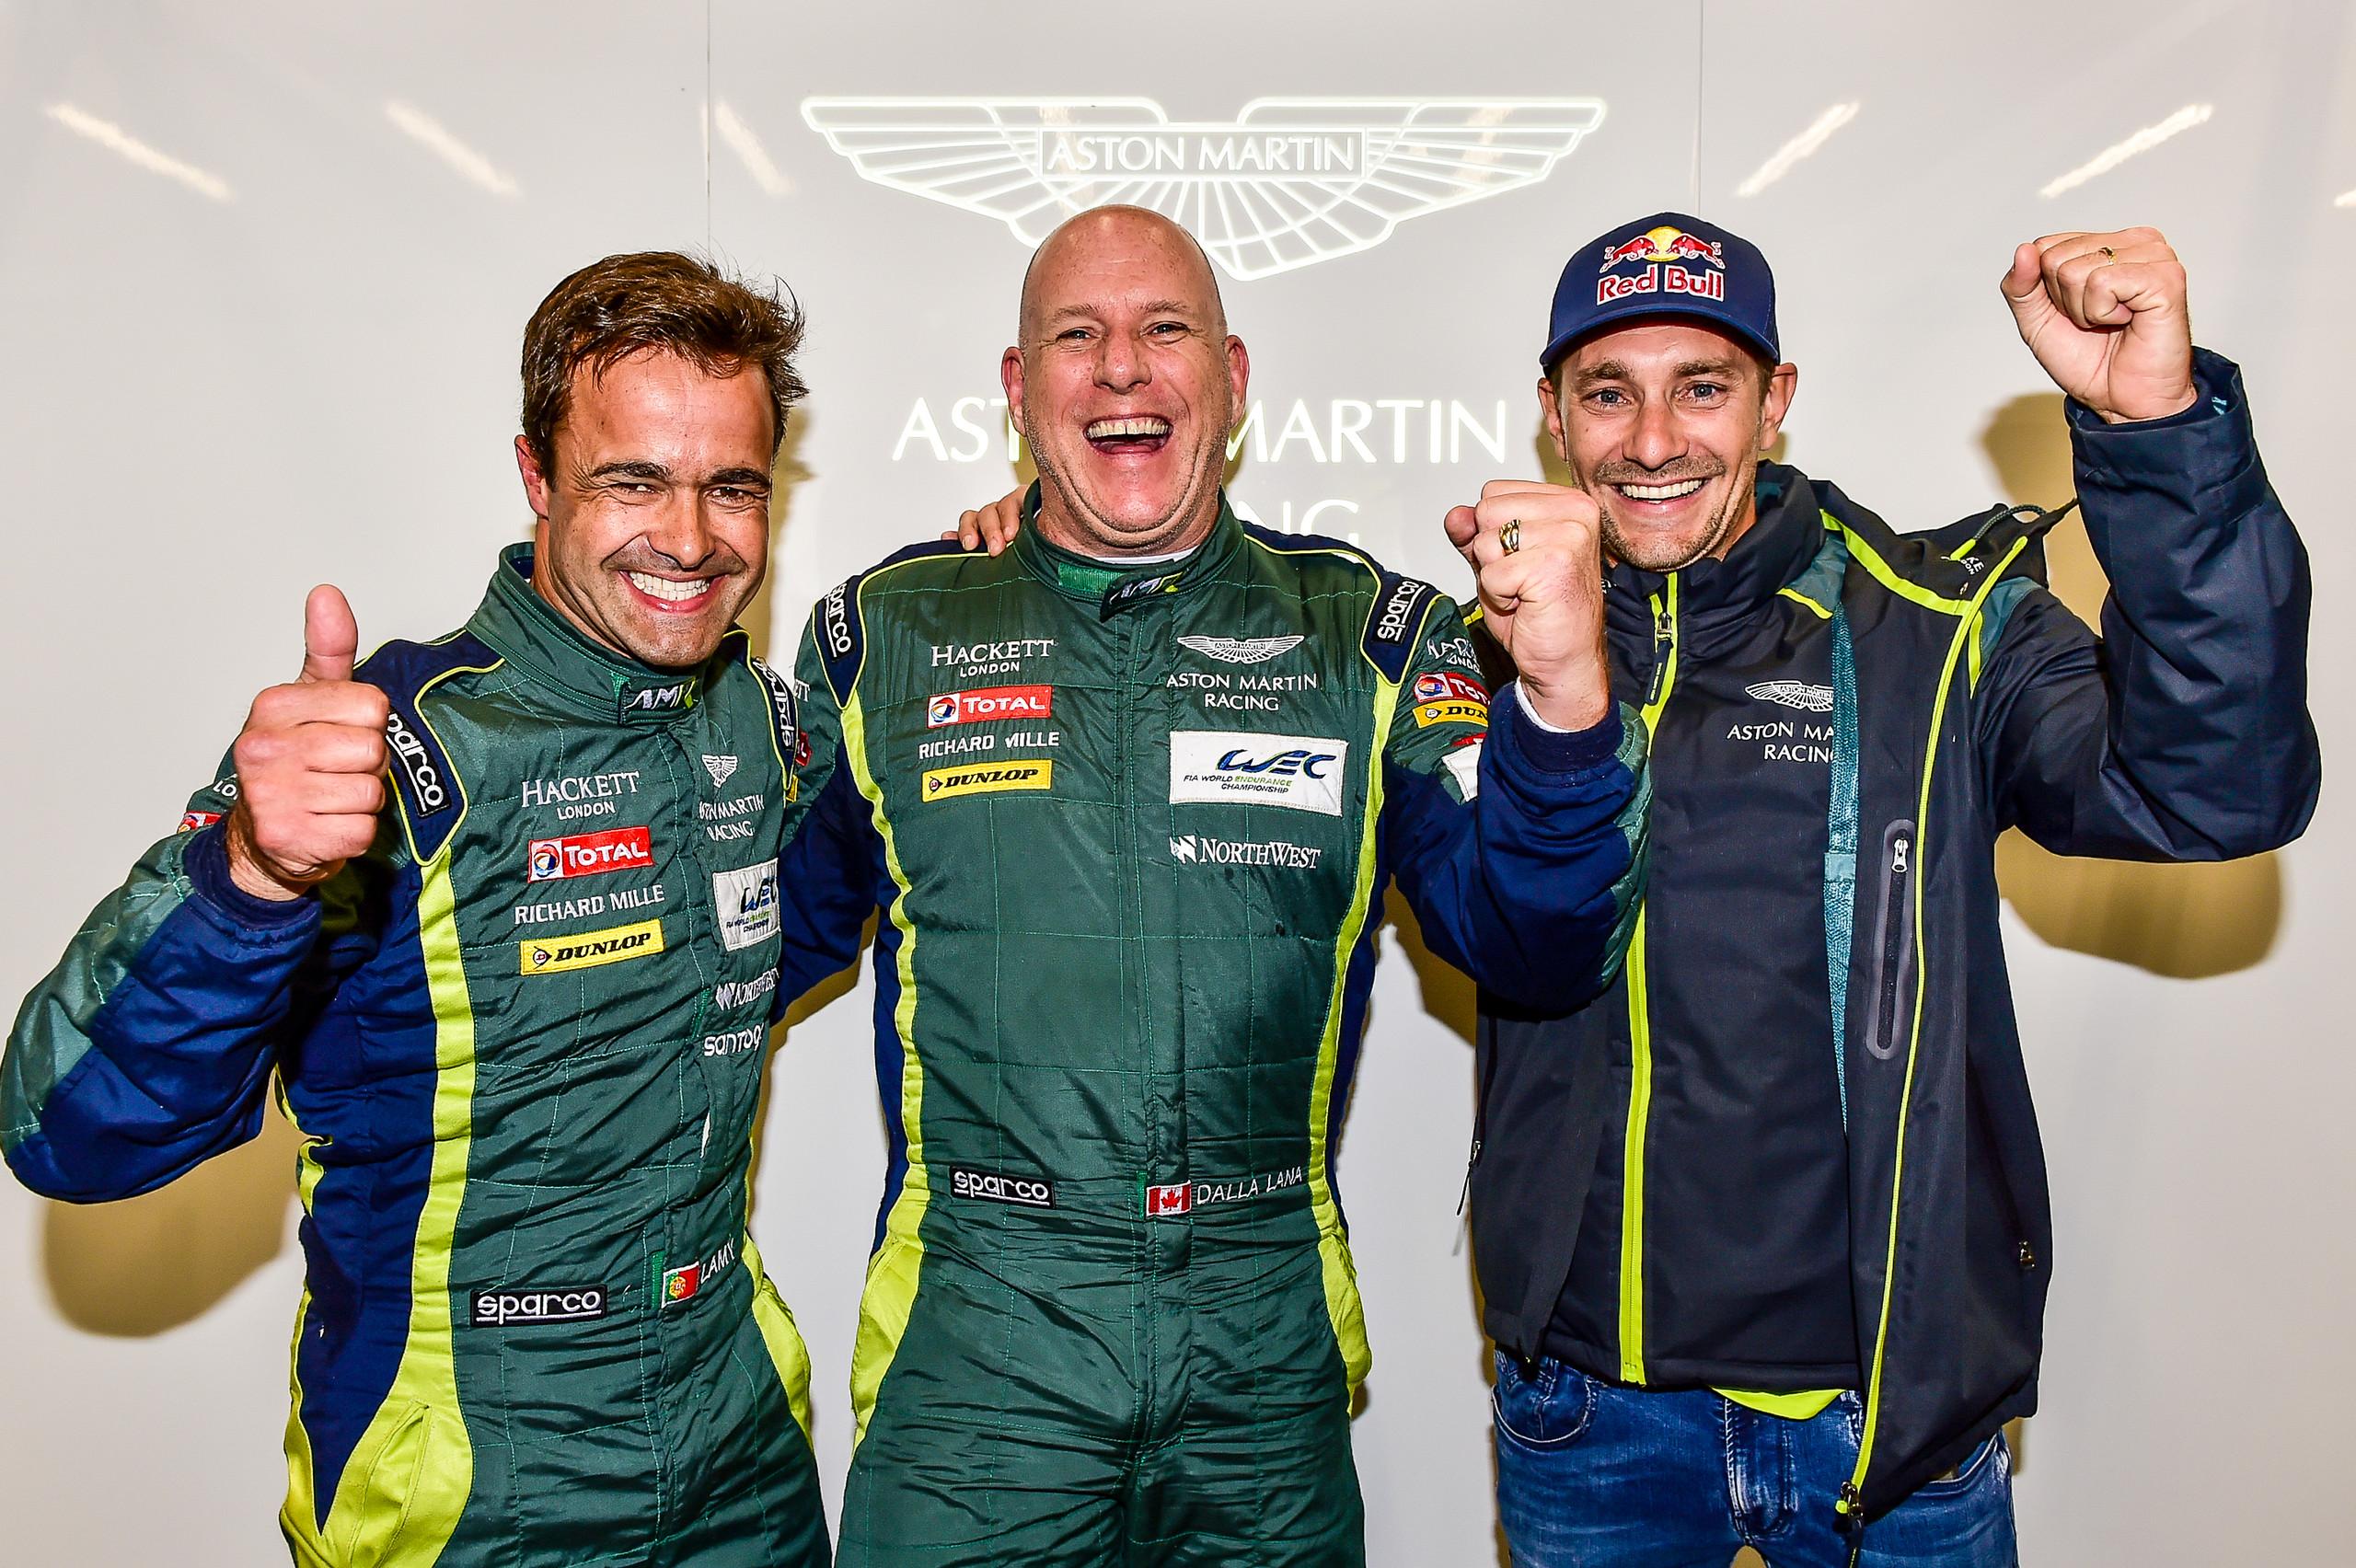 Ferrari And Aston Martin Claim Lmgte Poles At Spa Fia World Enduranc